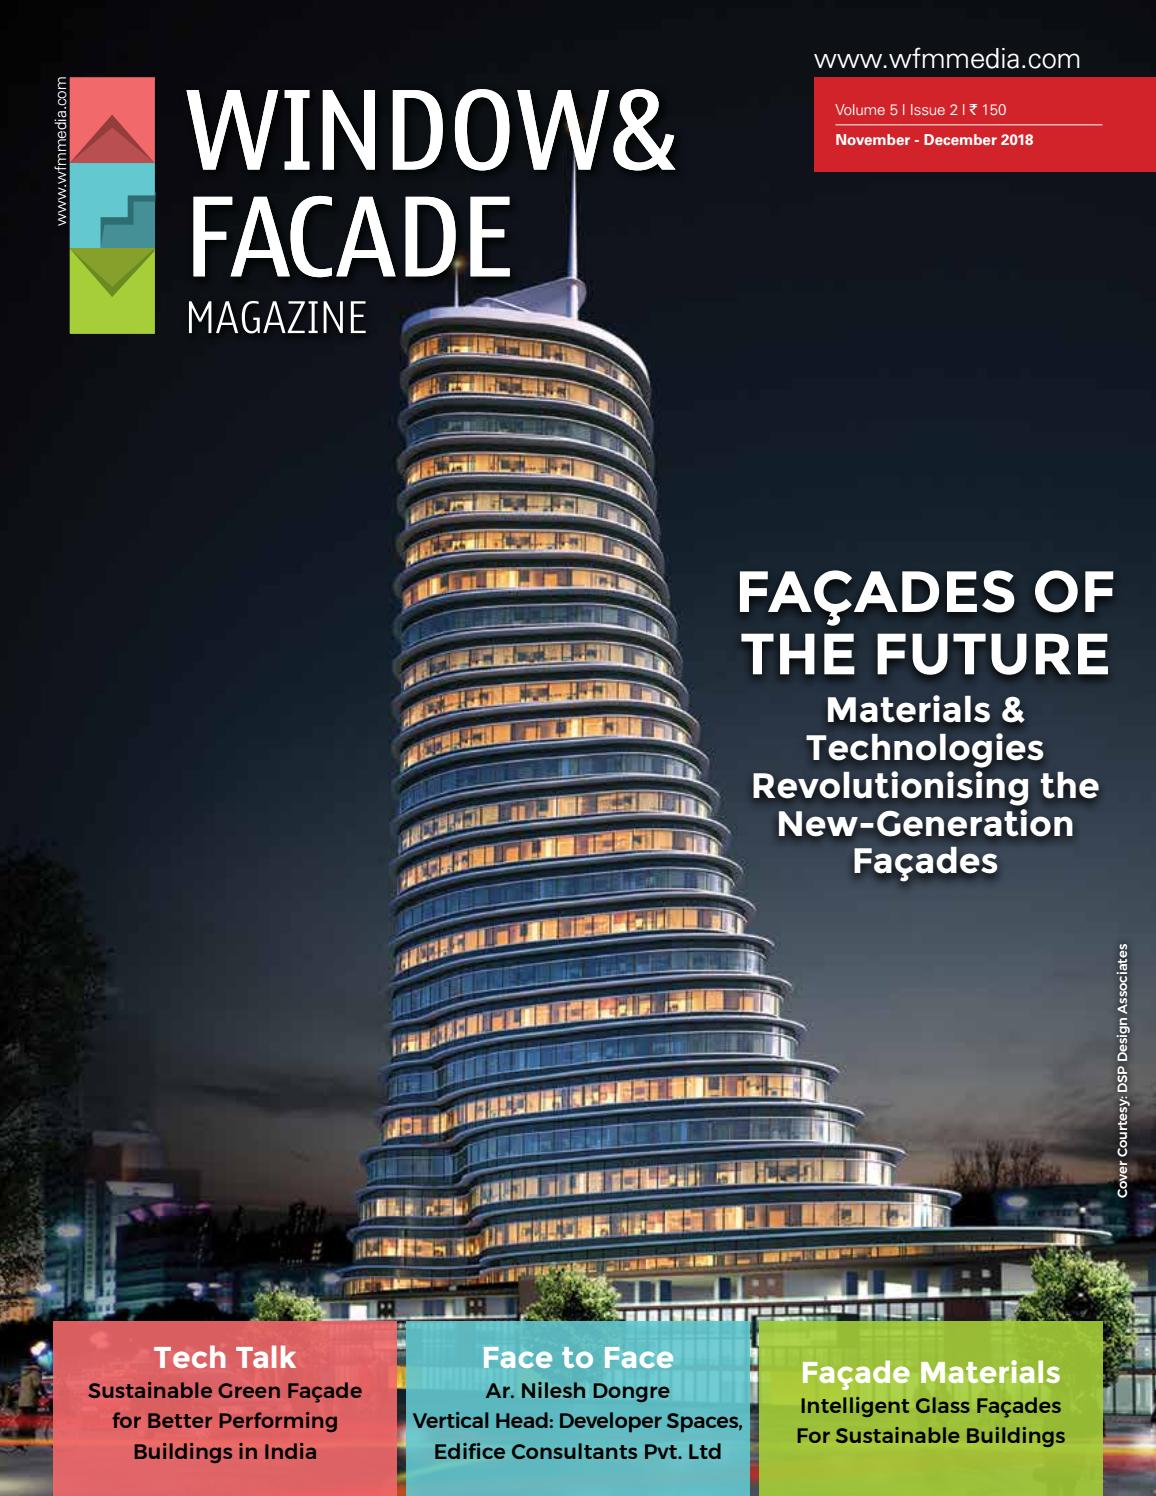 Window & Facade Magazine - November/December 2018 issue by F